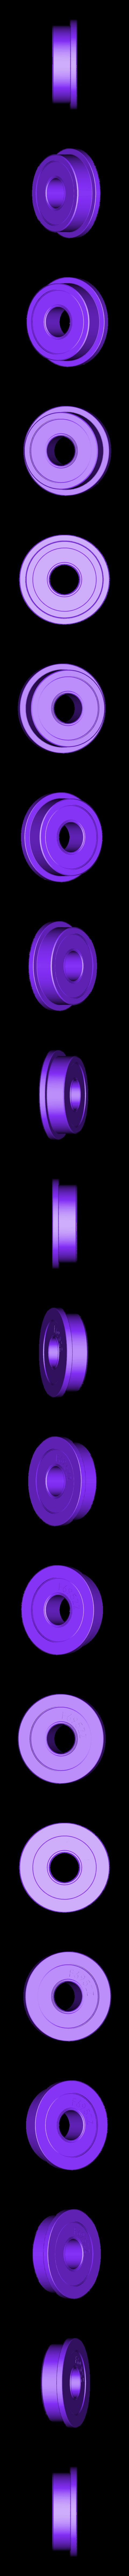 Table-SAW - F695ZZ-2.STL Download free STL file Table SAW • 3D print object, perinski